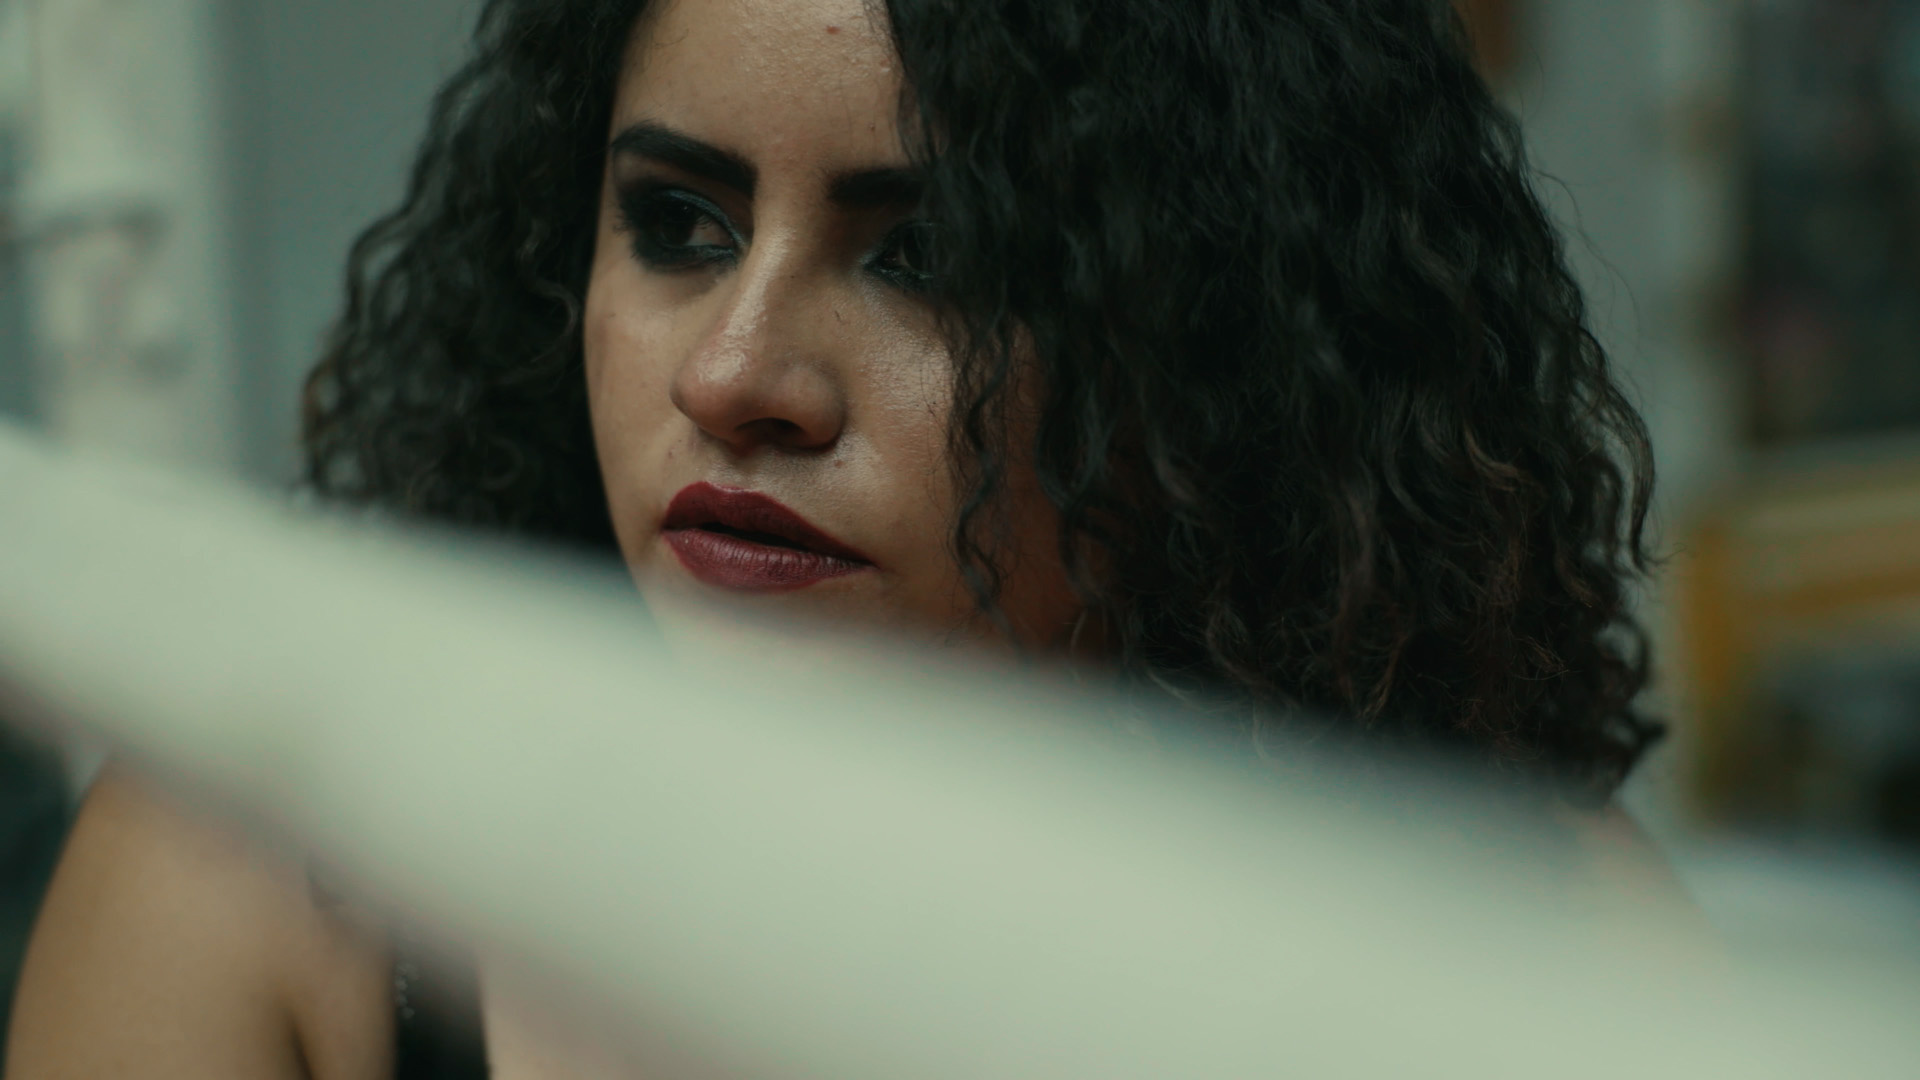 Imagen de película: ¿Me vas a gritar?